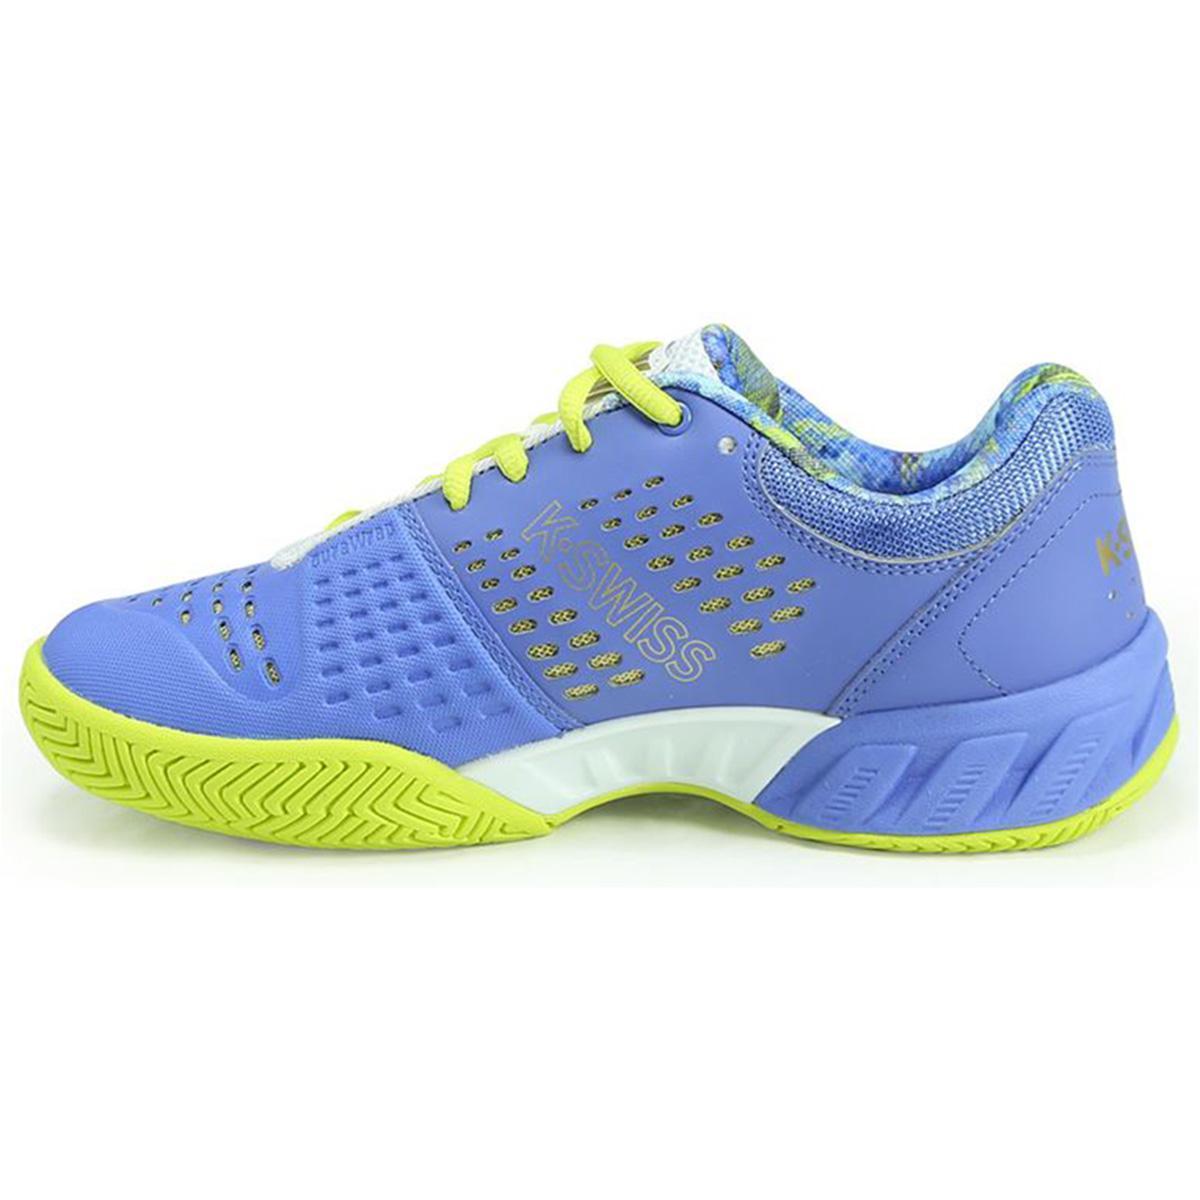 K-Swiss Kids BigShot Light 2.5 Shoes - White/Blue - Tennisnuts.com